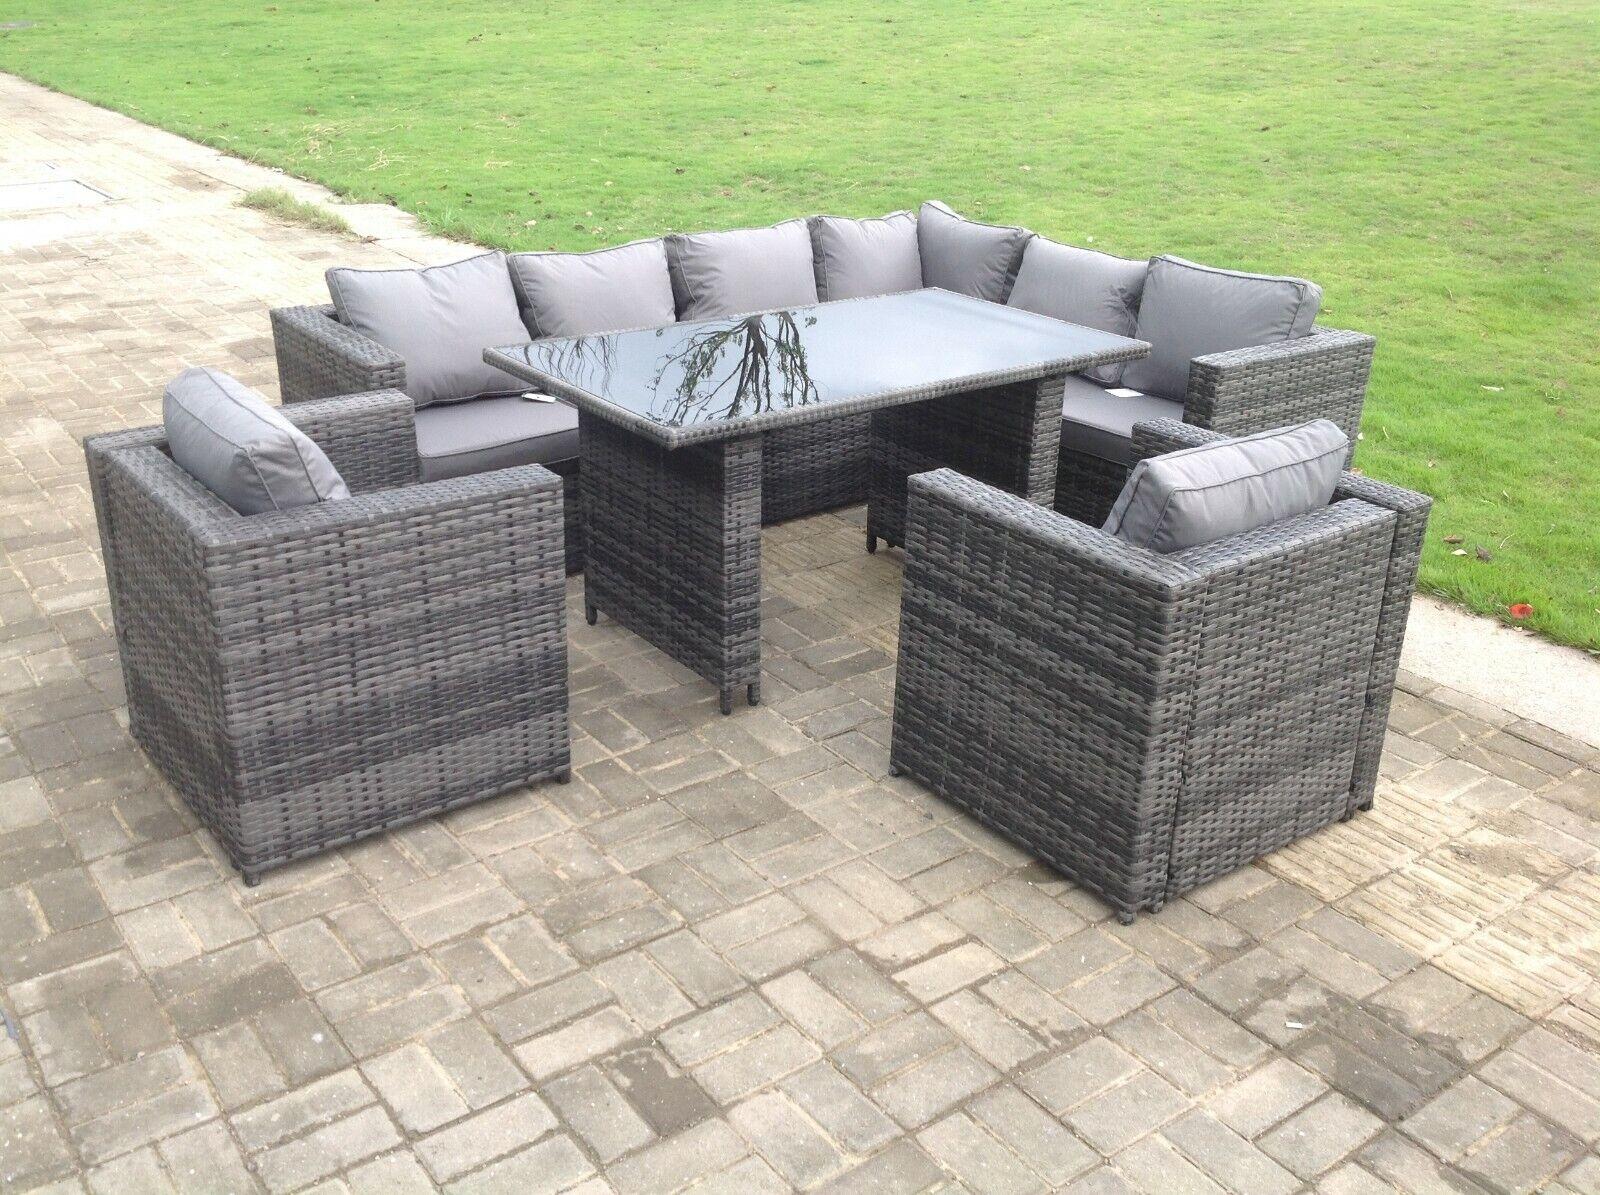 Garden Furniture - Right arm 8 seat rattan sofa table chair furniture set outdoor garden furniture